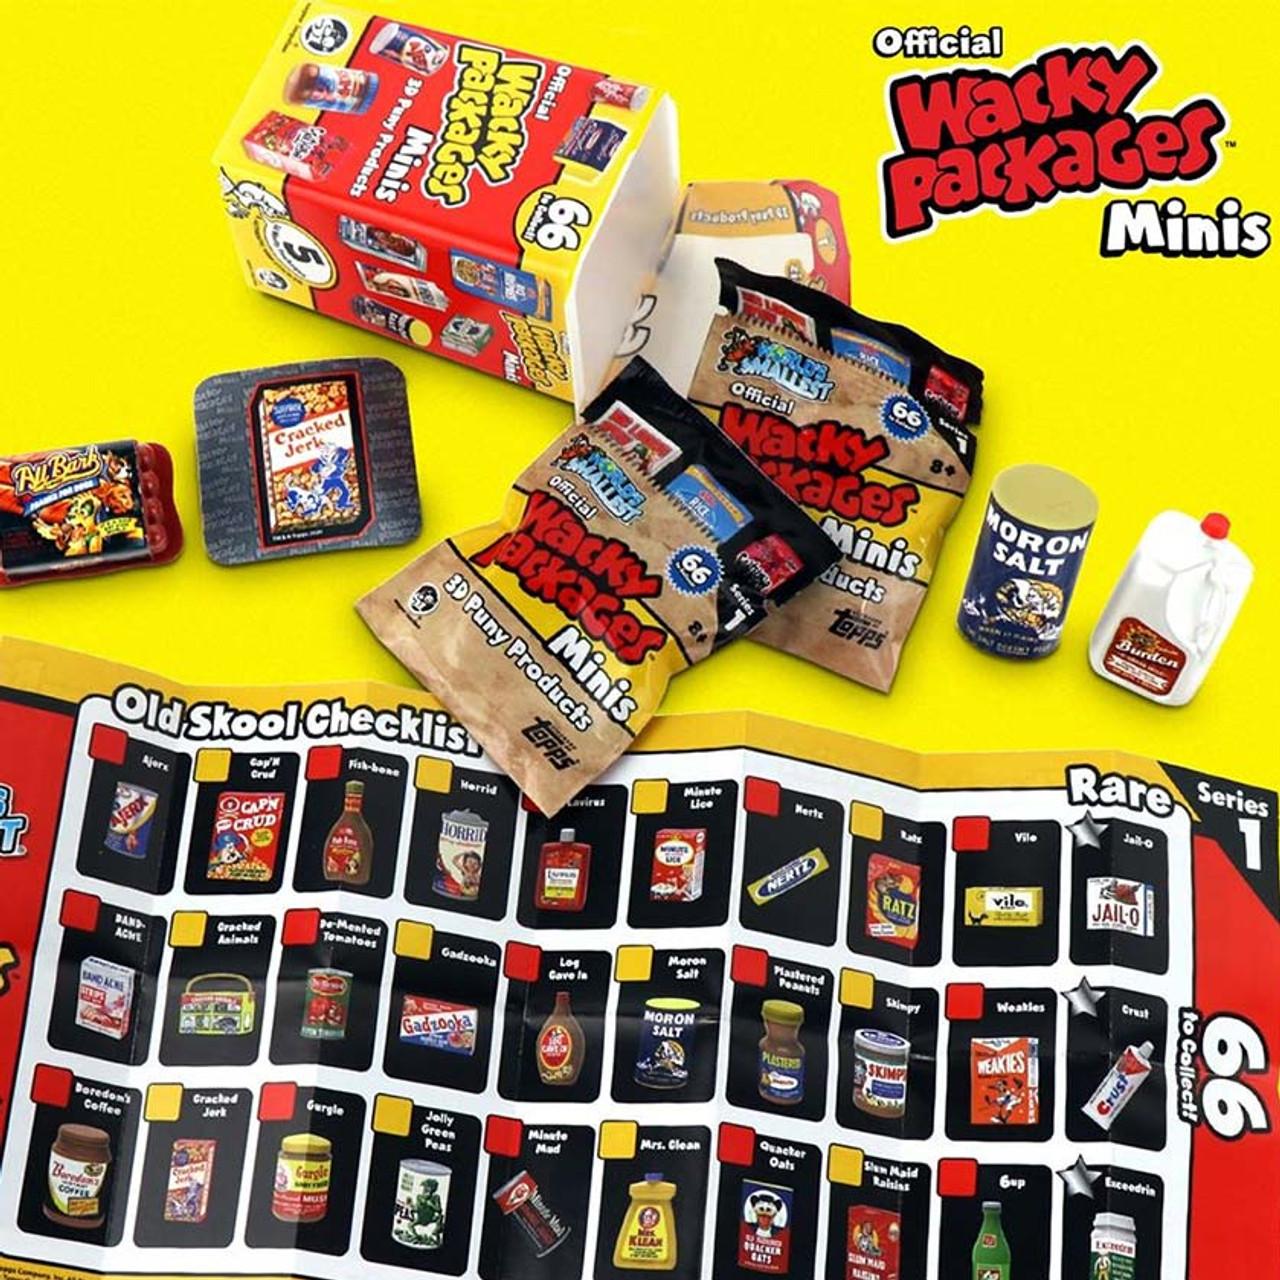 Super Impulse Wacky Packages Mini Blind Box